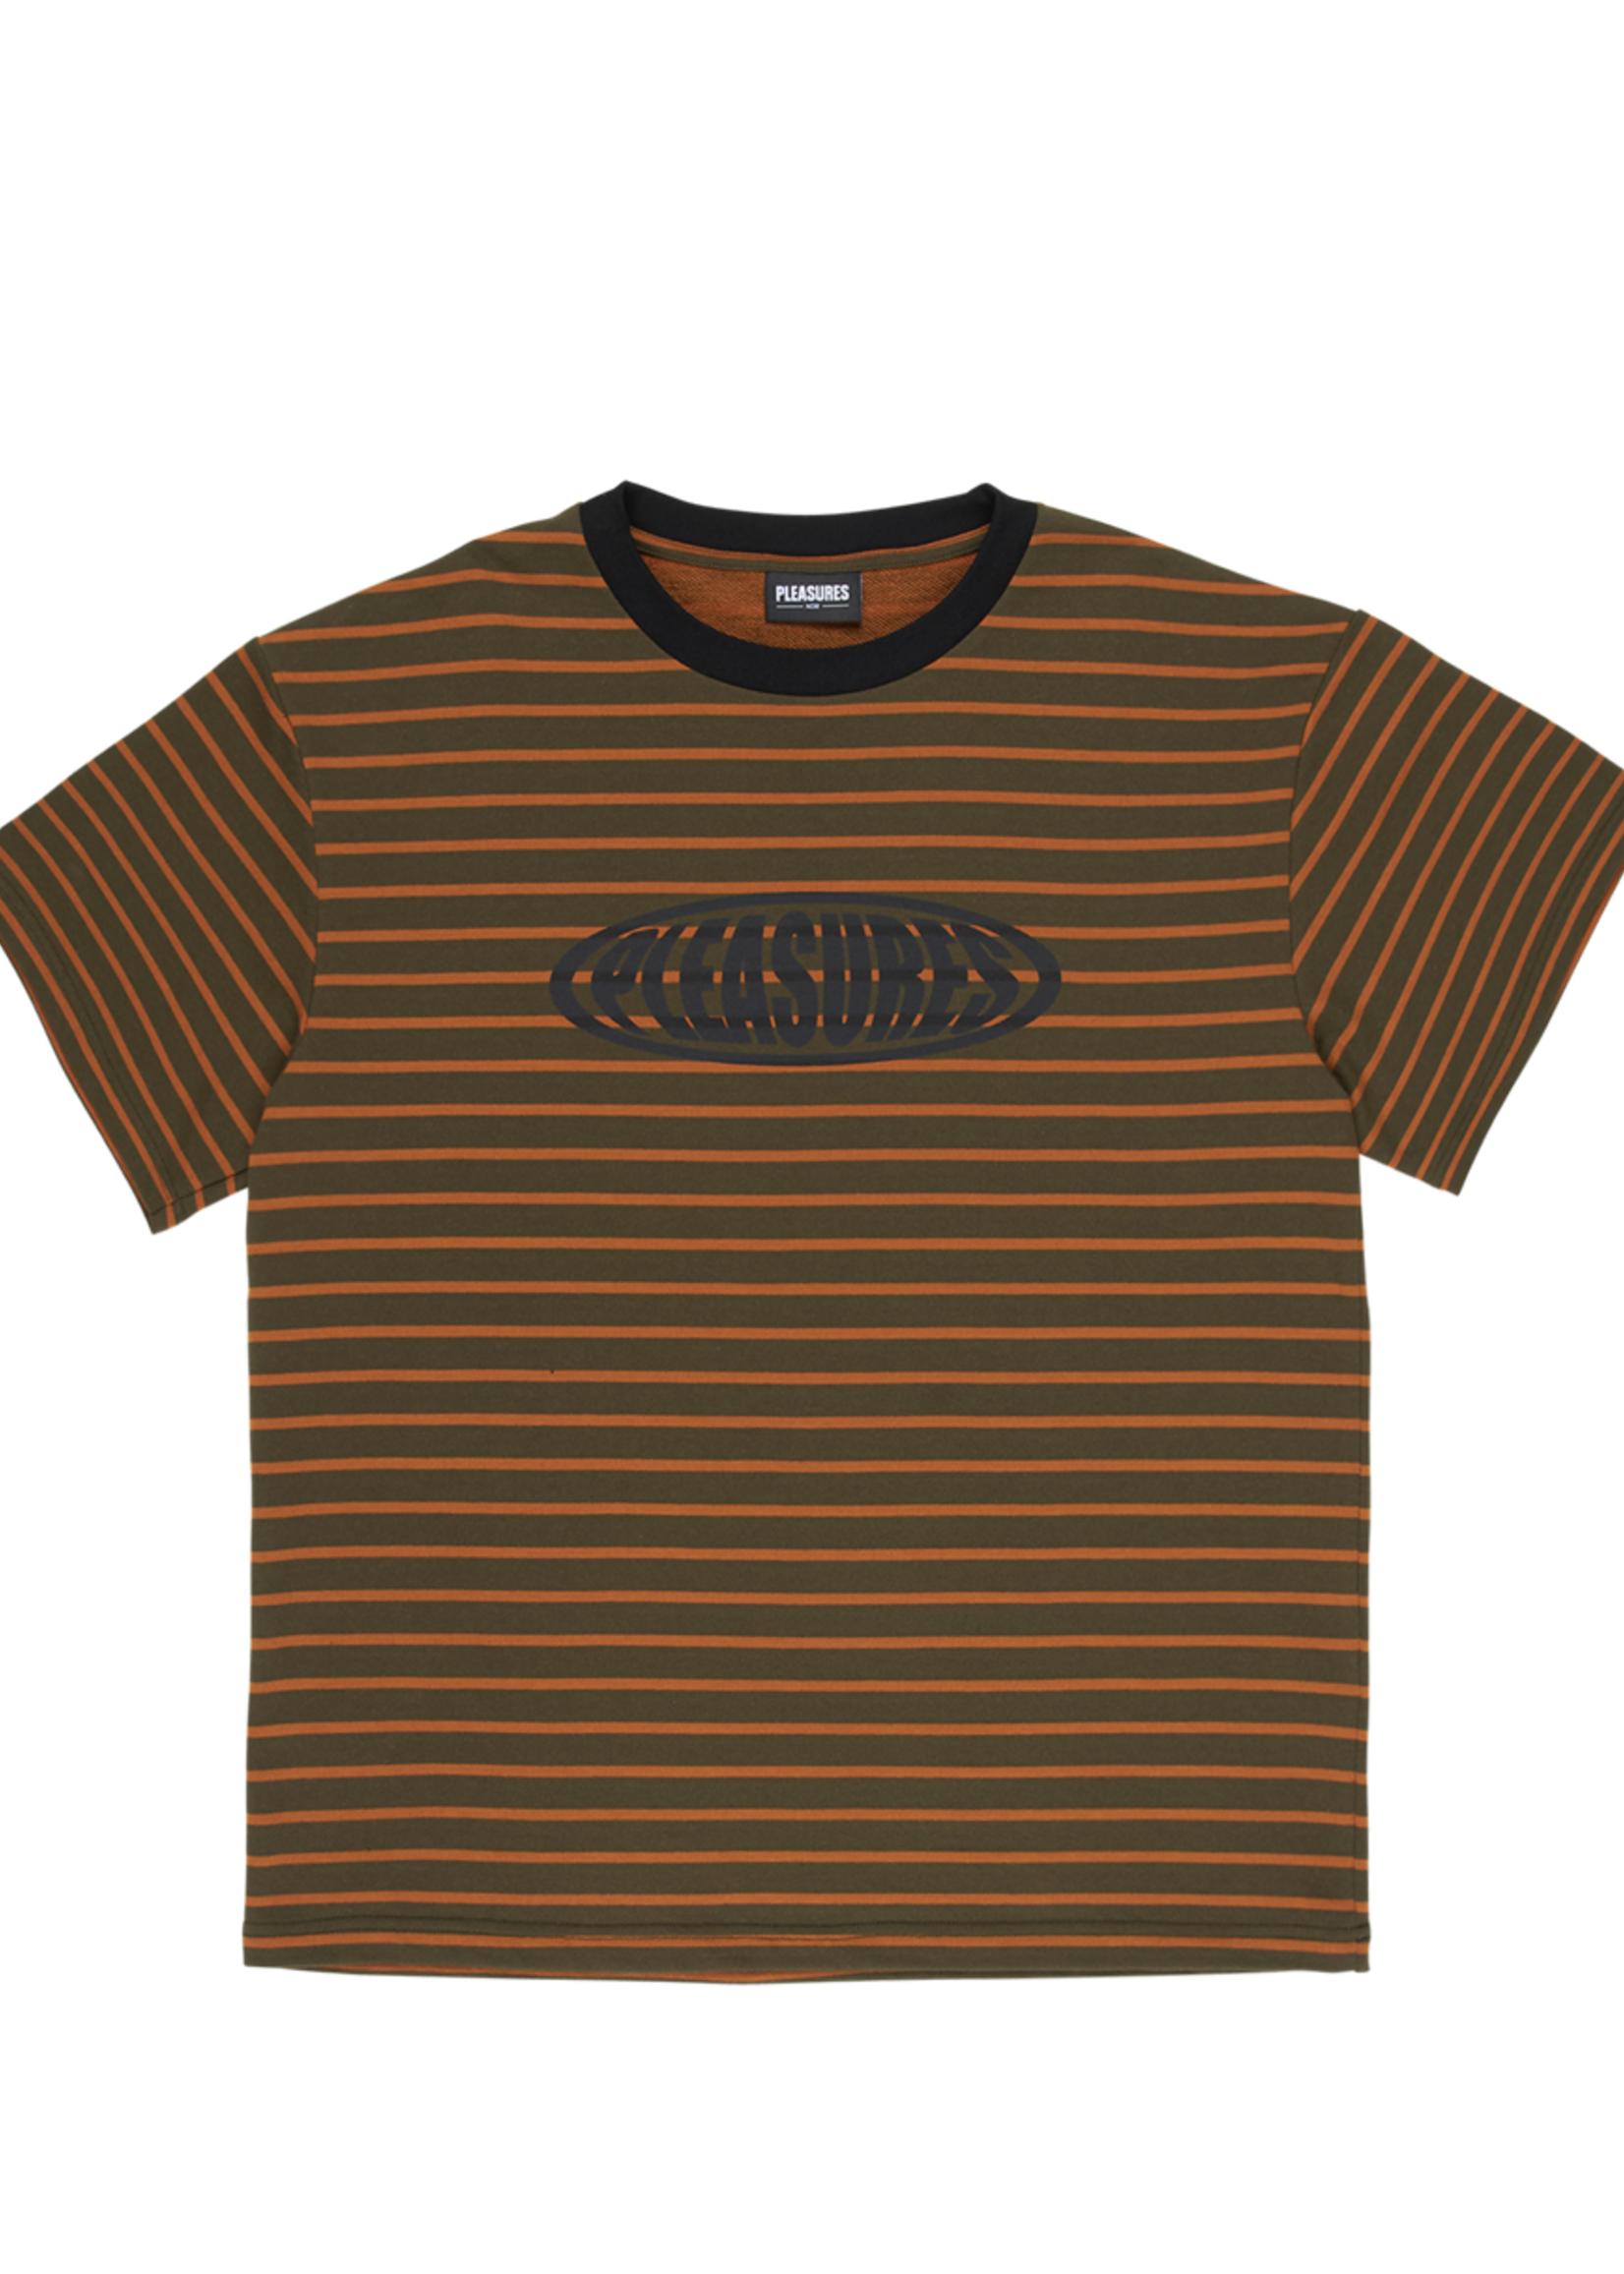 PLEASURES Sports StripeT-Shirt in Orange